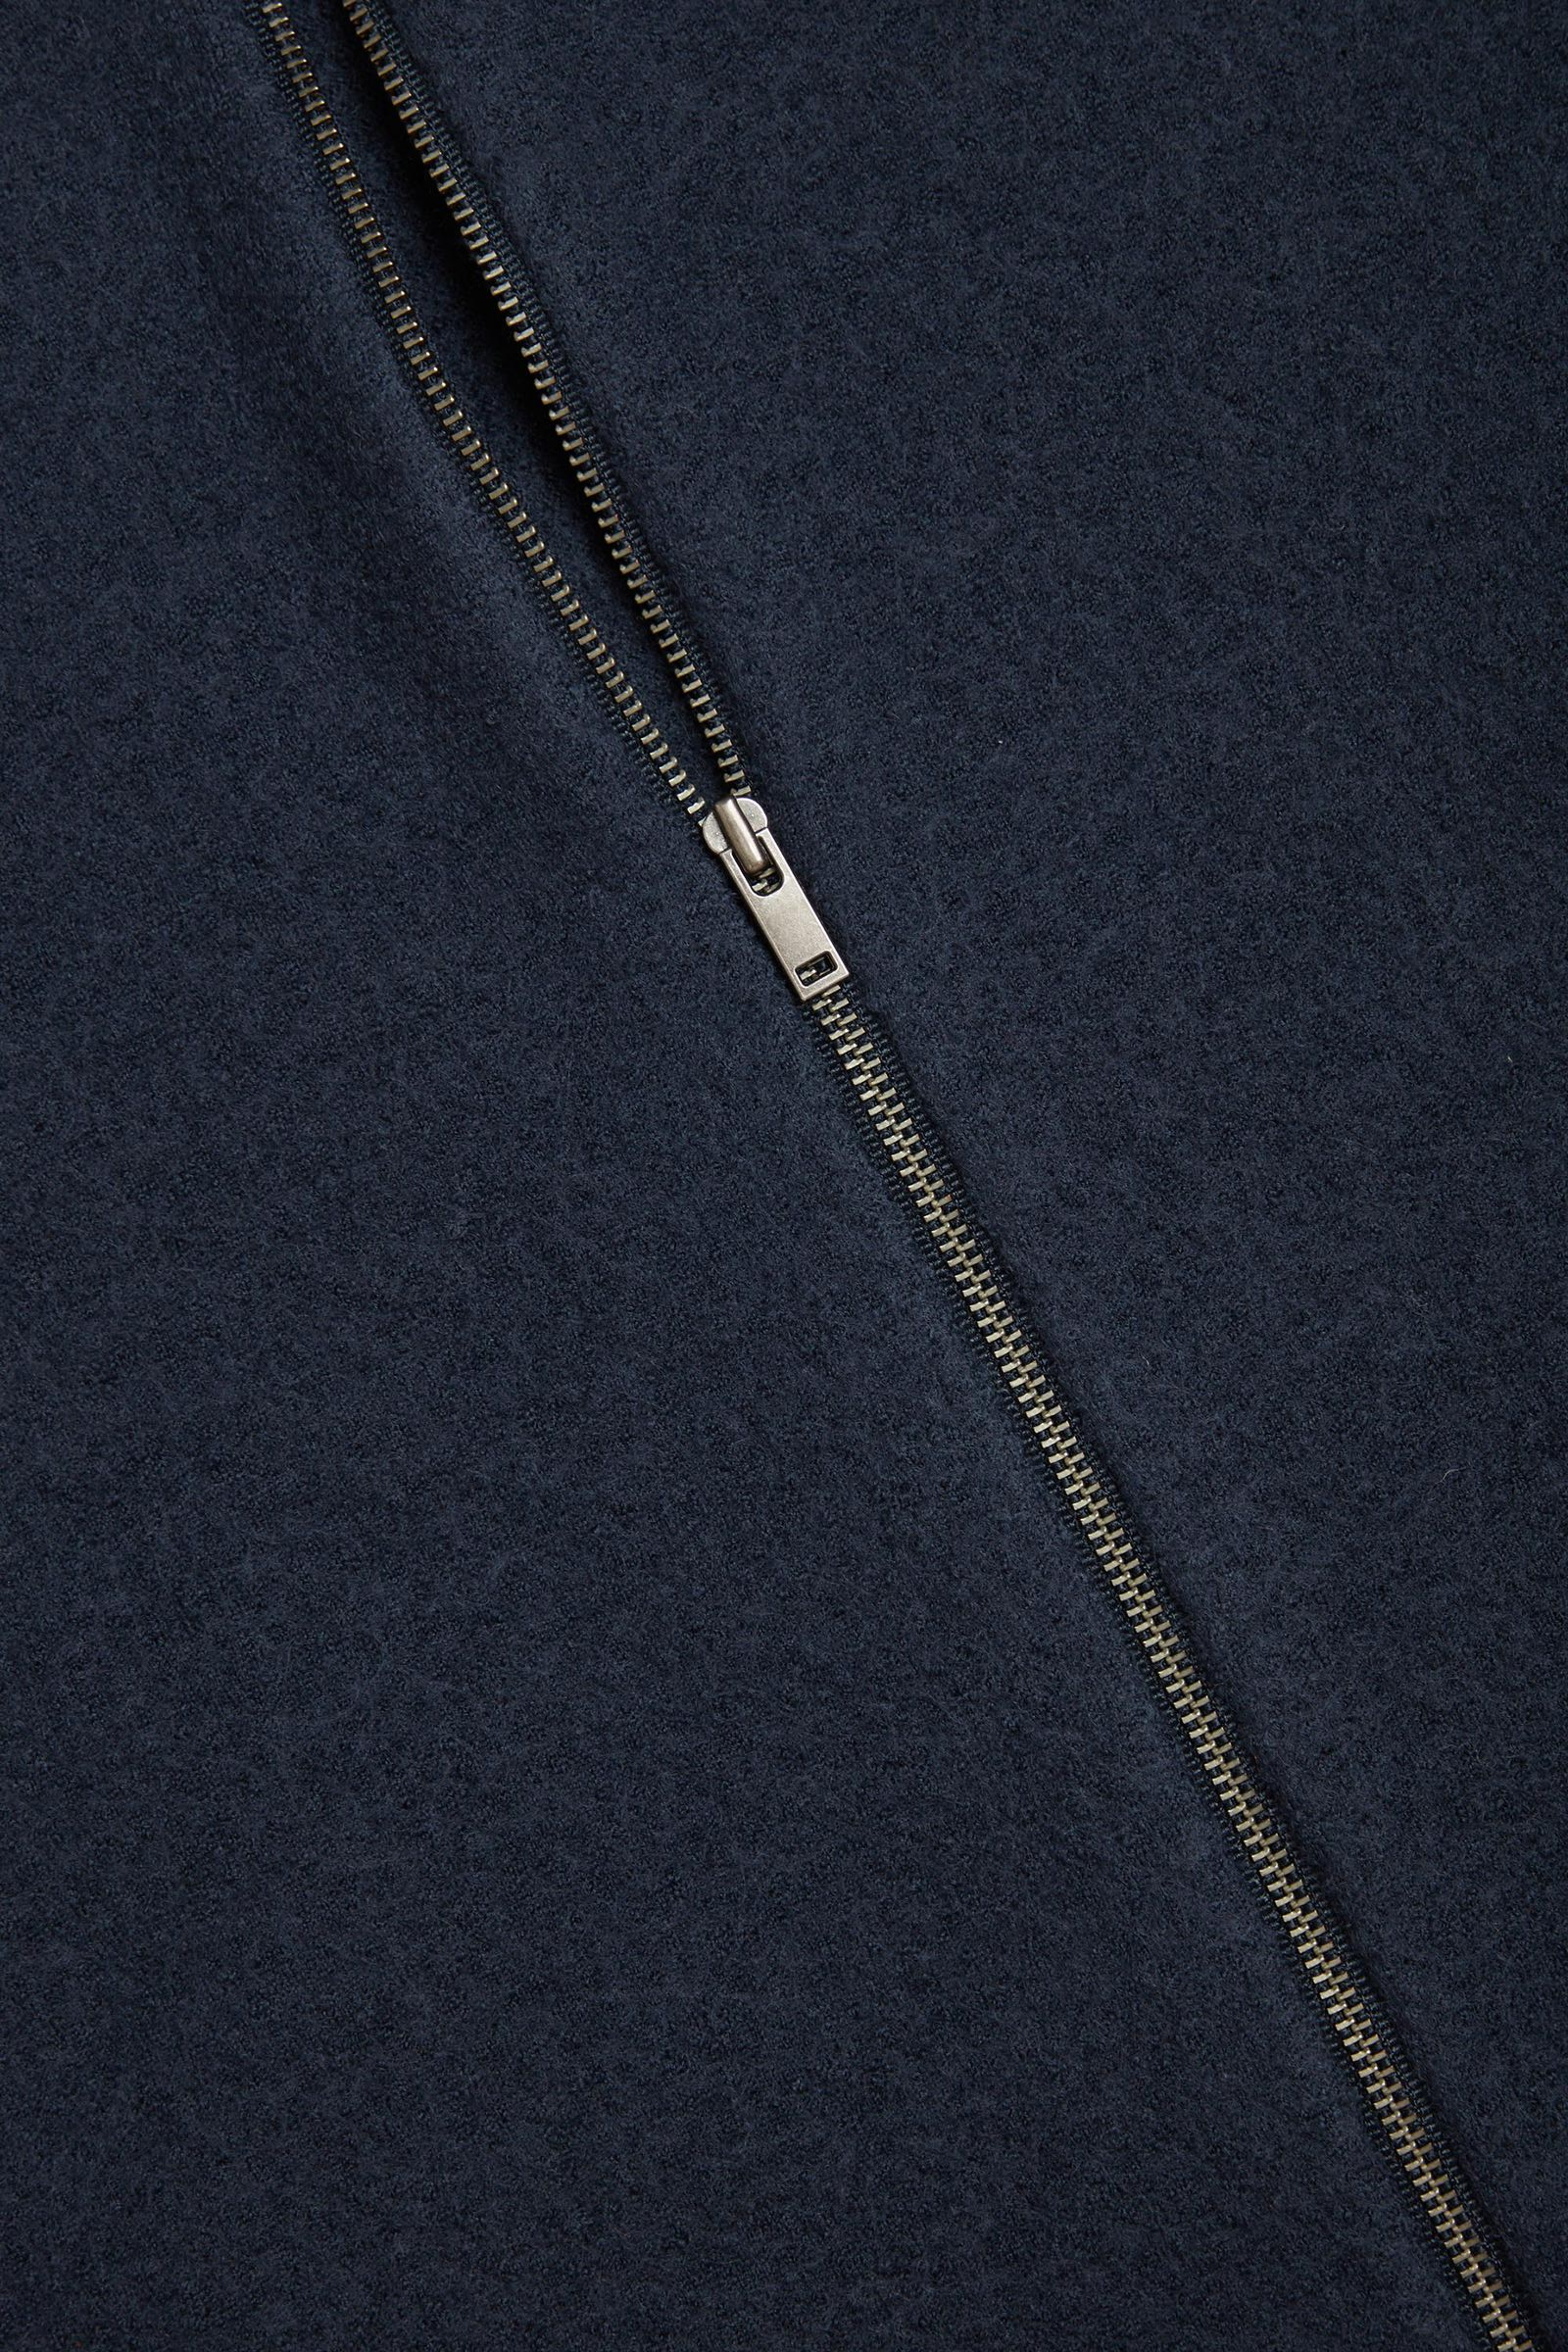 COS 메리노 울 후드 집업 드레스의 블루컬러 Detail입니다.